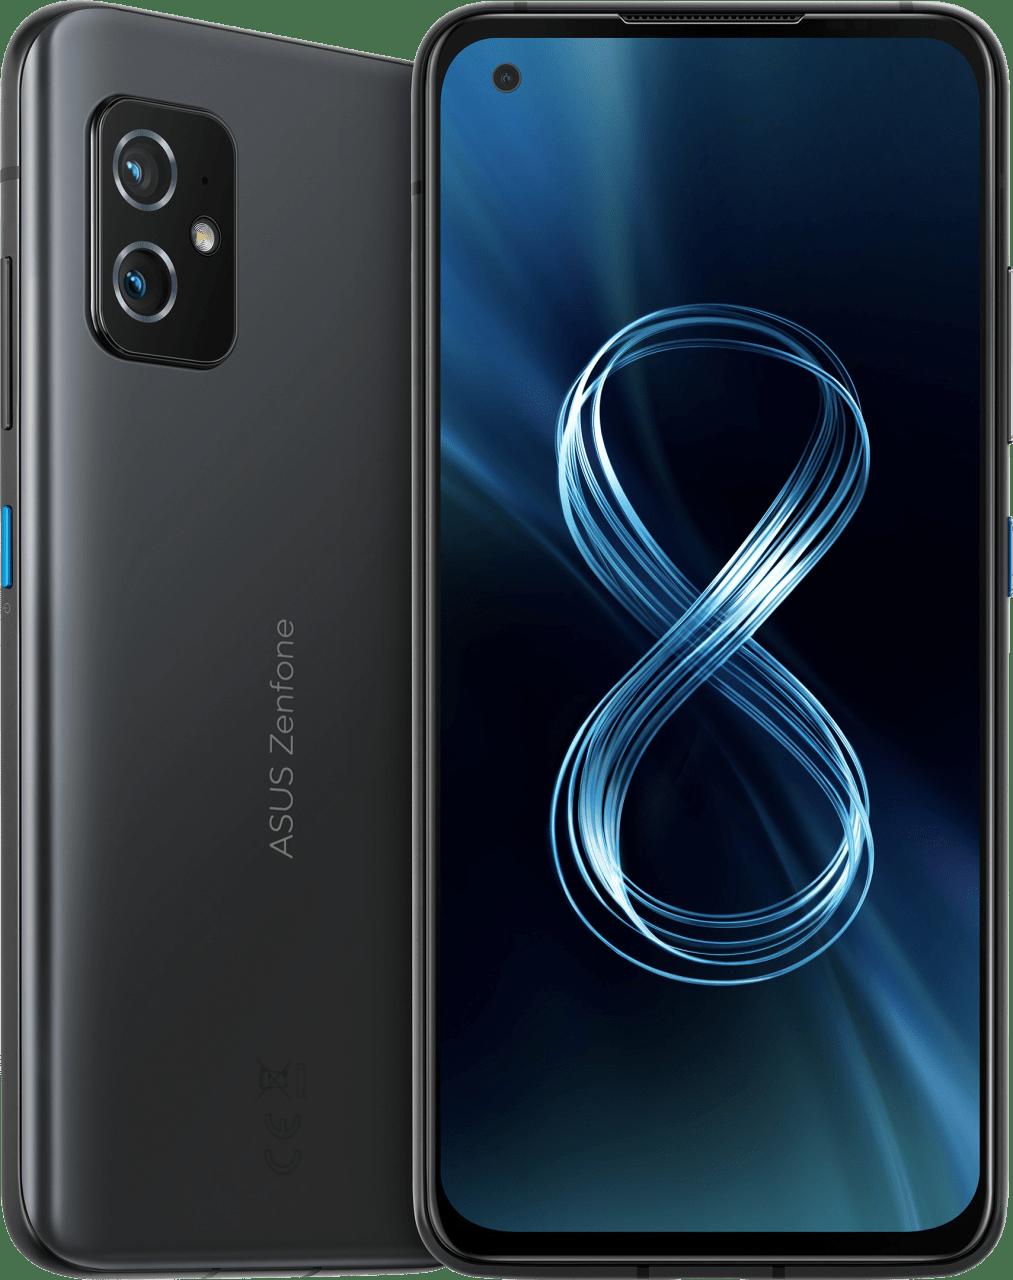 Black Asus Smartphone Zenfone 8 - 256GB - Dual Sim.2